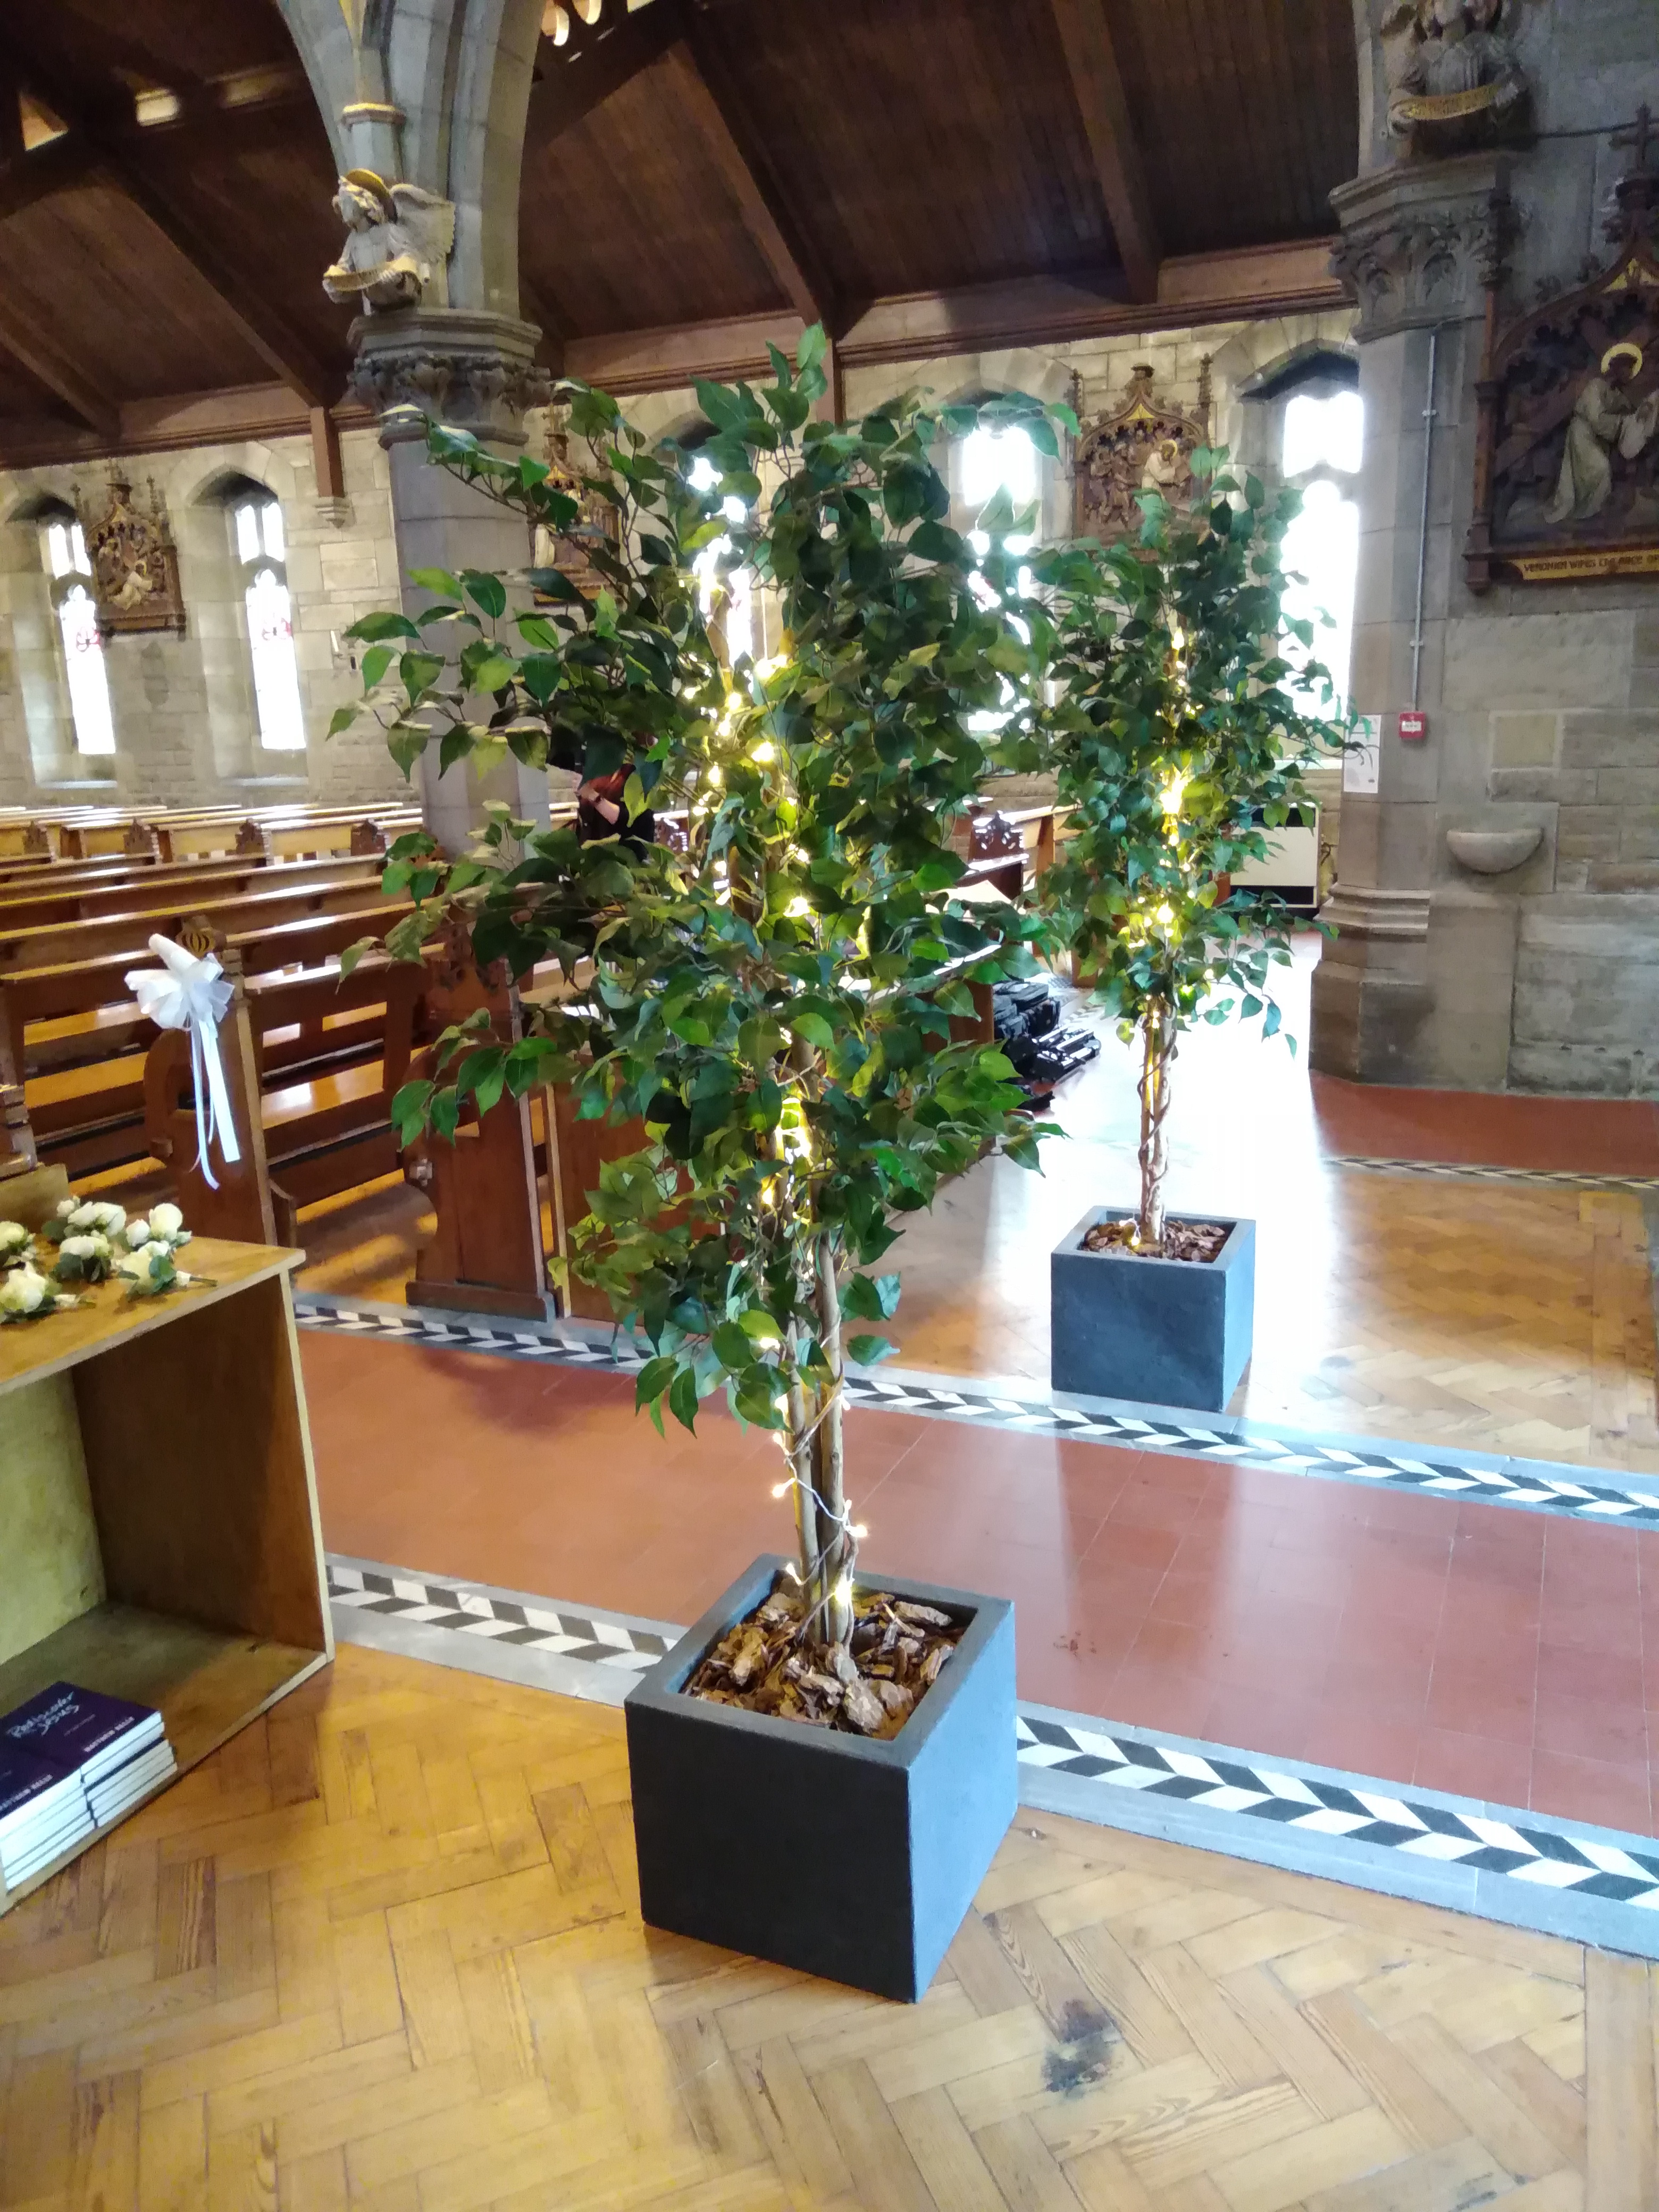 St Johns Church in Portobello, Edinburgh